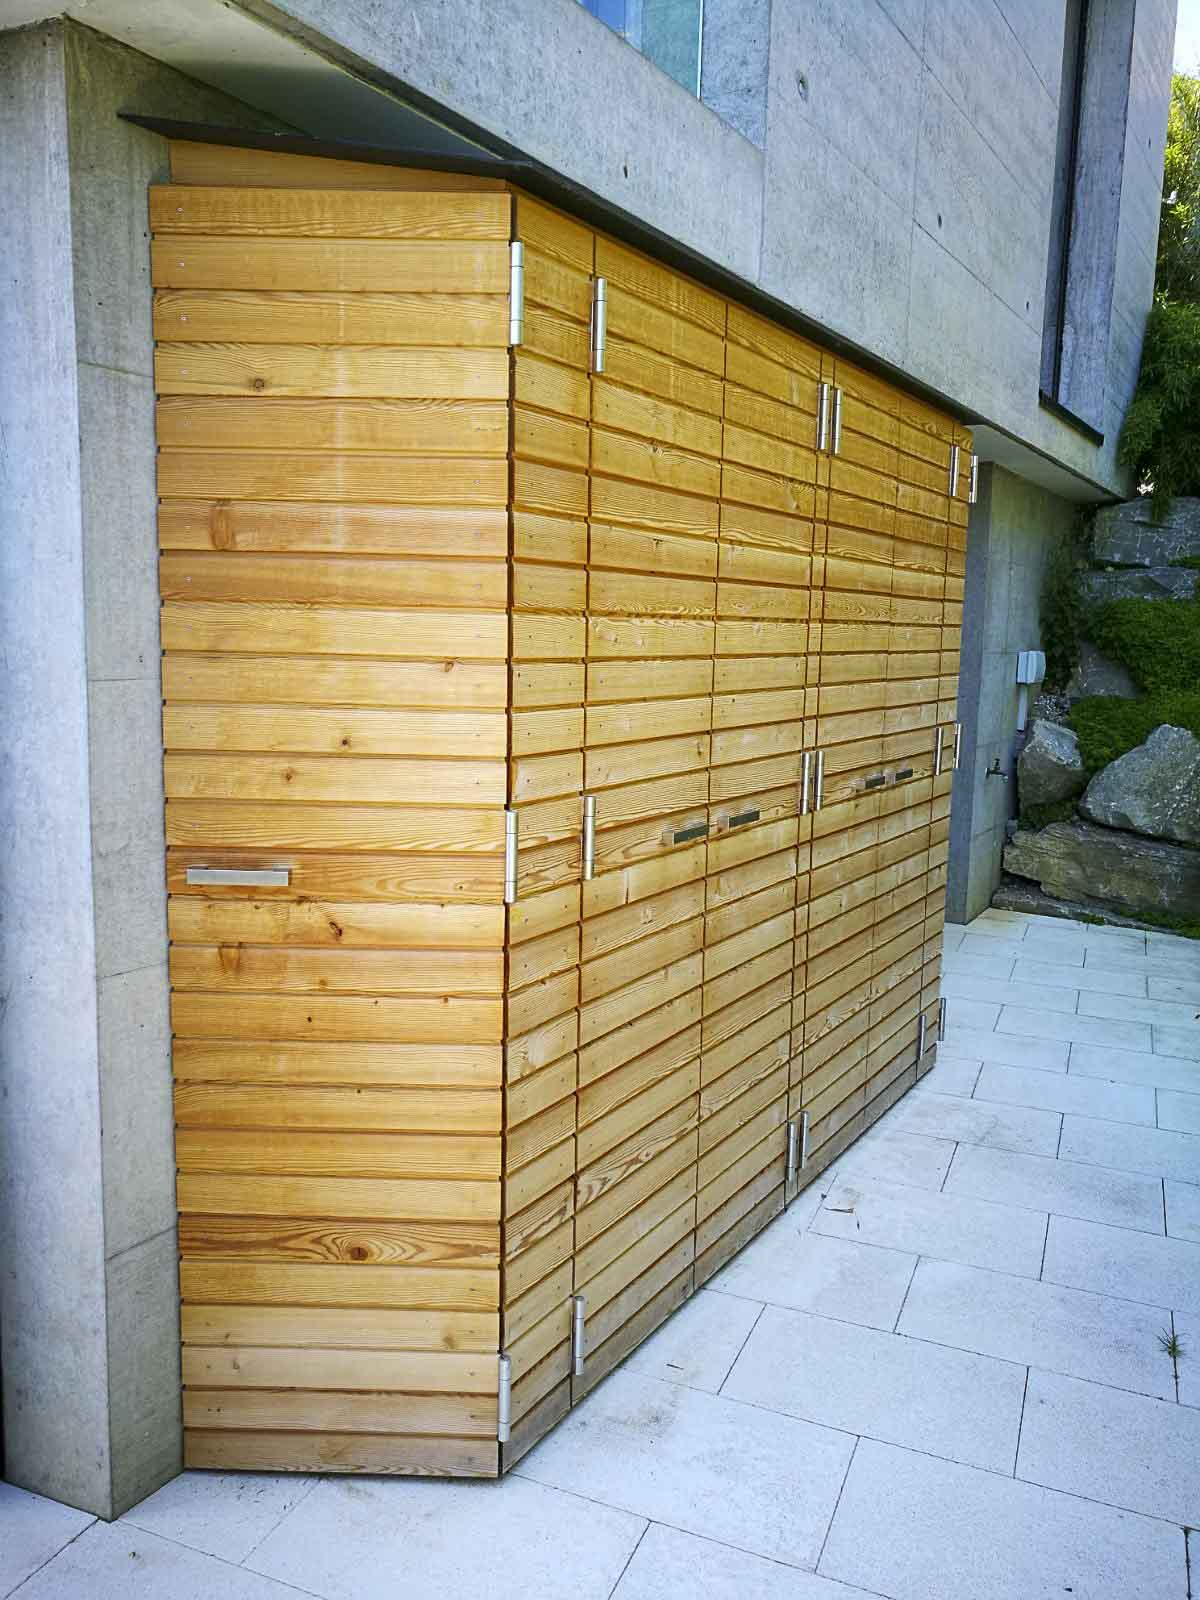 Wooddesign_Terrassengestaltung_Aussenschrank_Lärchenholz vergraut_Holzverschalung_Türen (3)